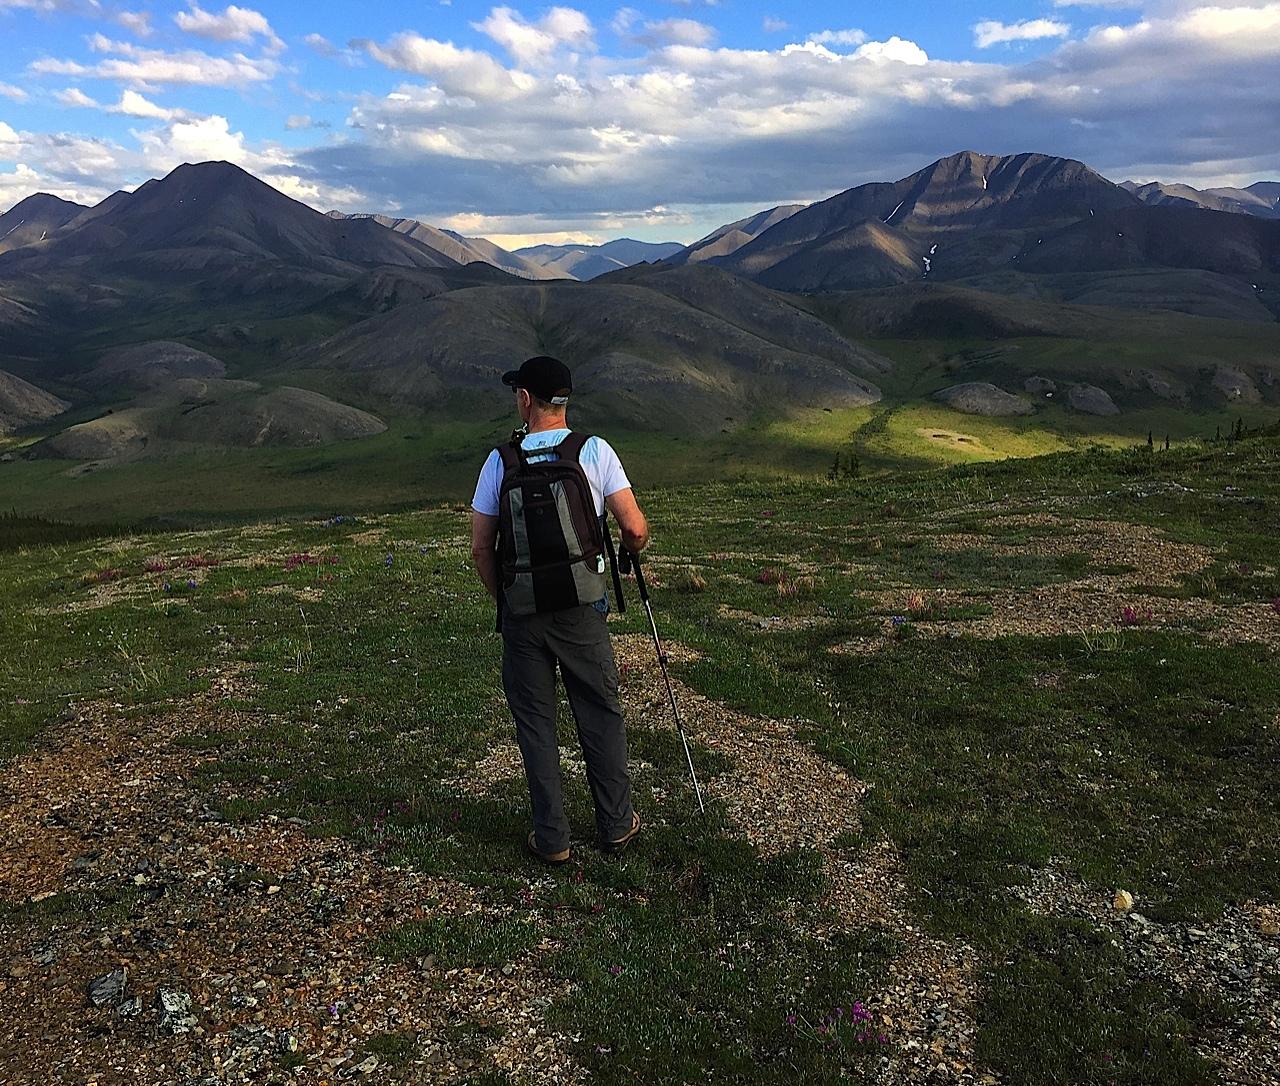 ivvavik national park canada - photo #13